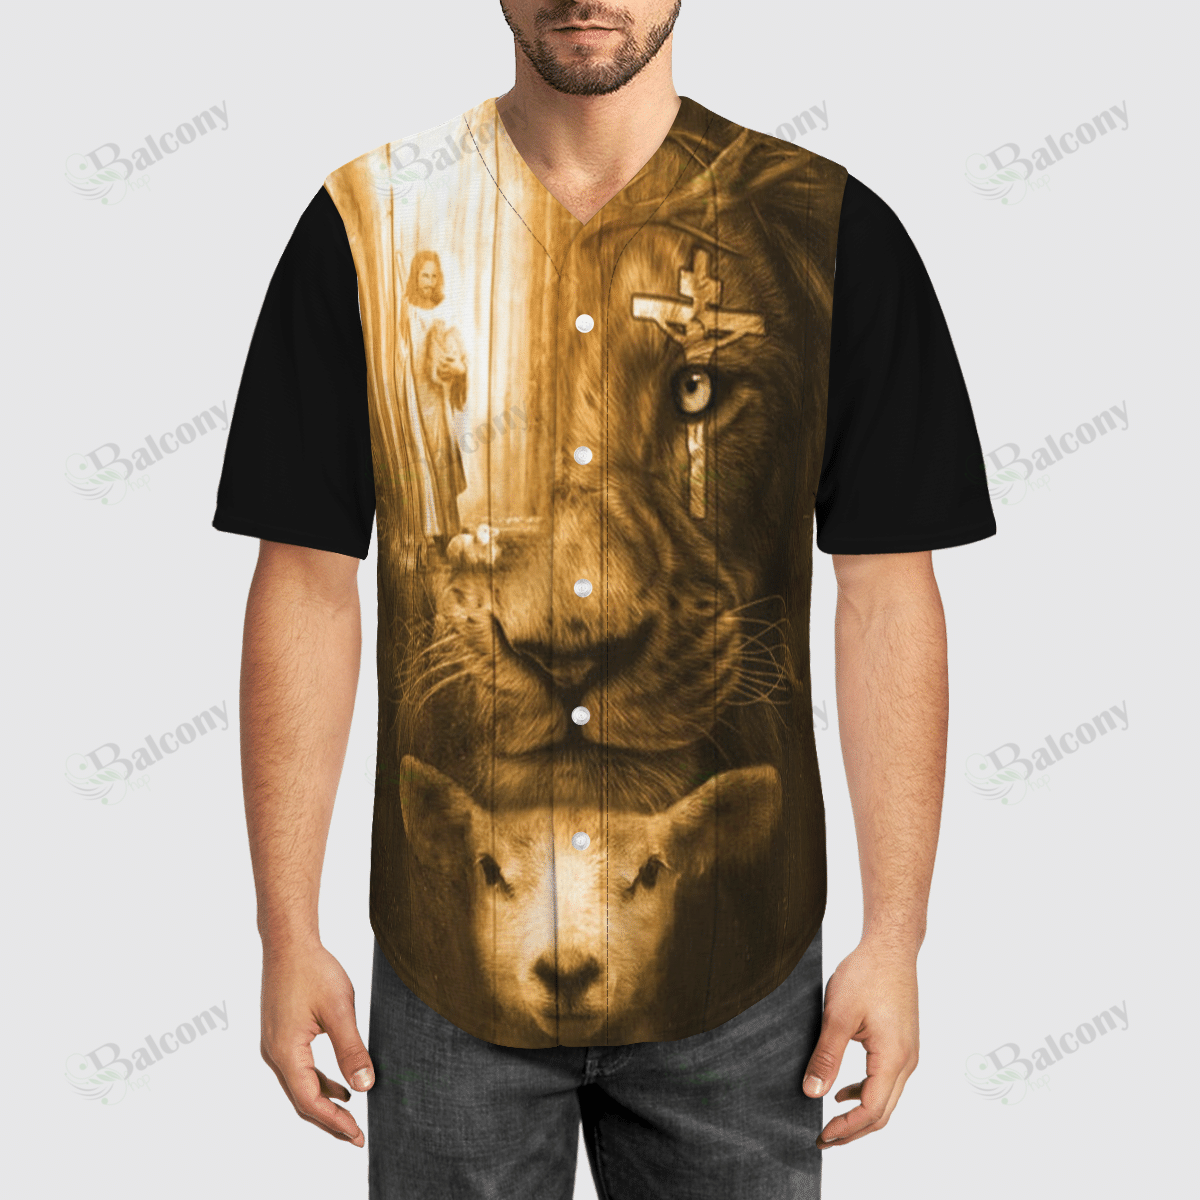 Jesus Sheep Lion Baseball Jersey shirt